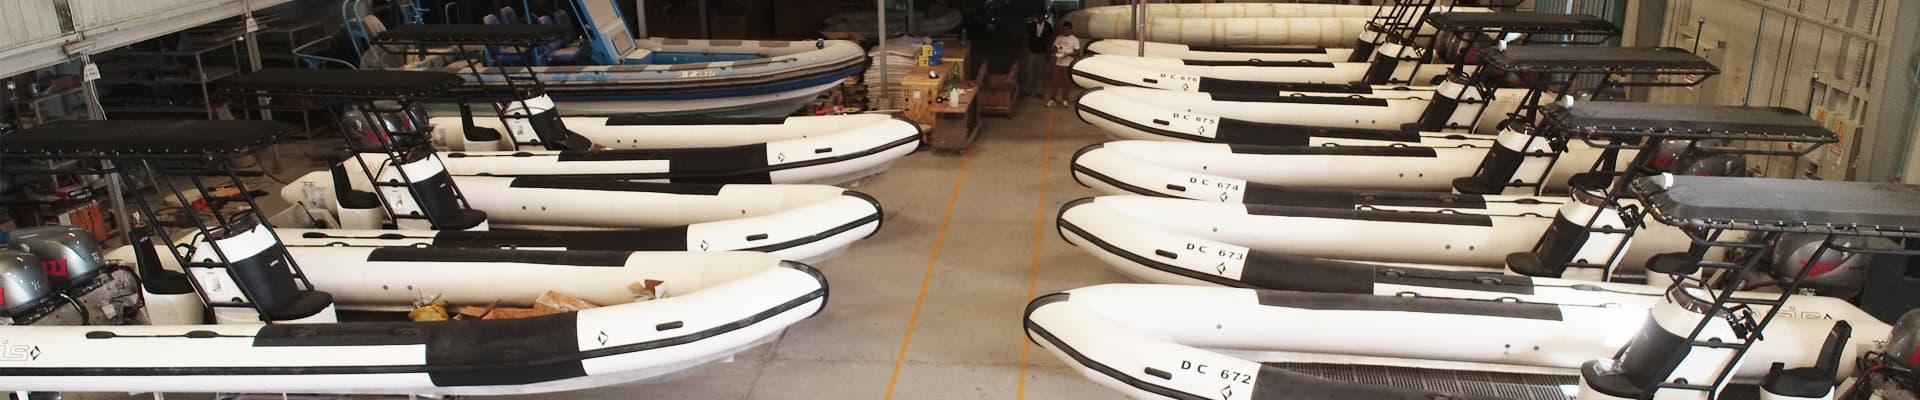 rigid-inflatable-boats-engineering